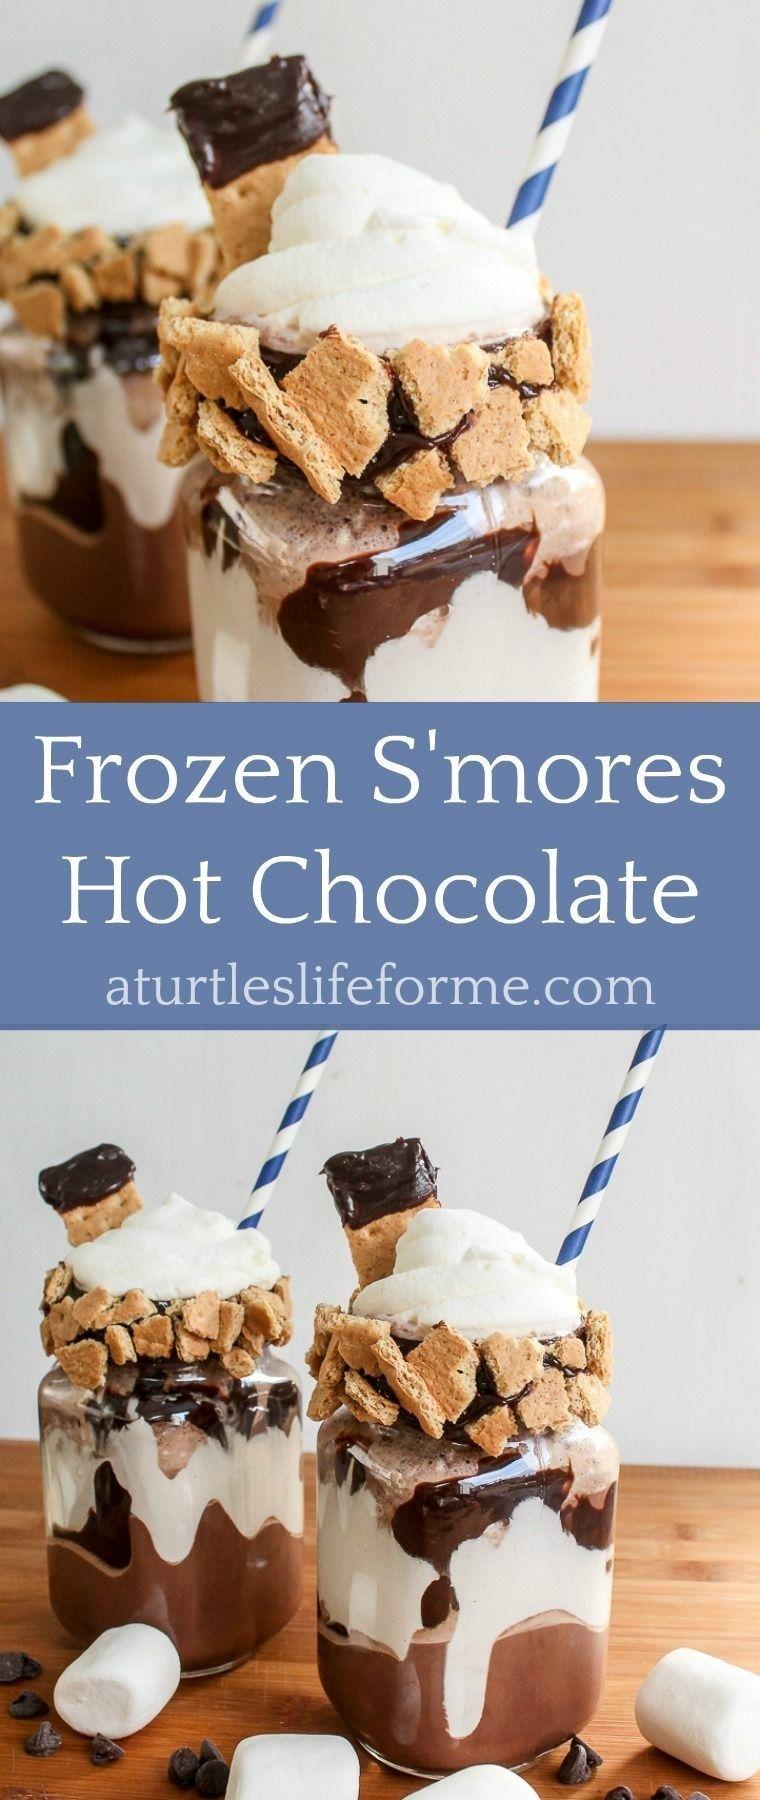 20 Best Frozen Hot Chocolate Recipes – Quick & Easy